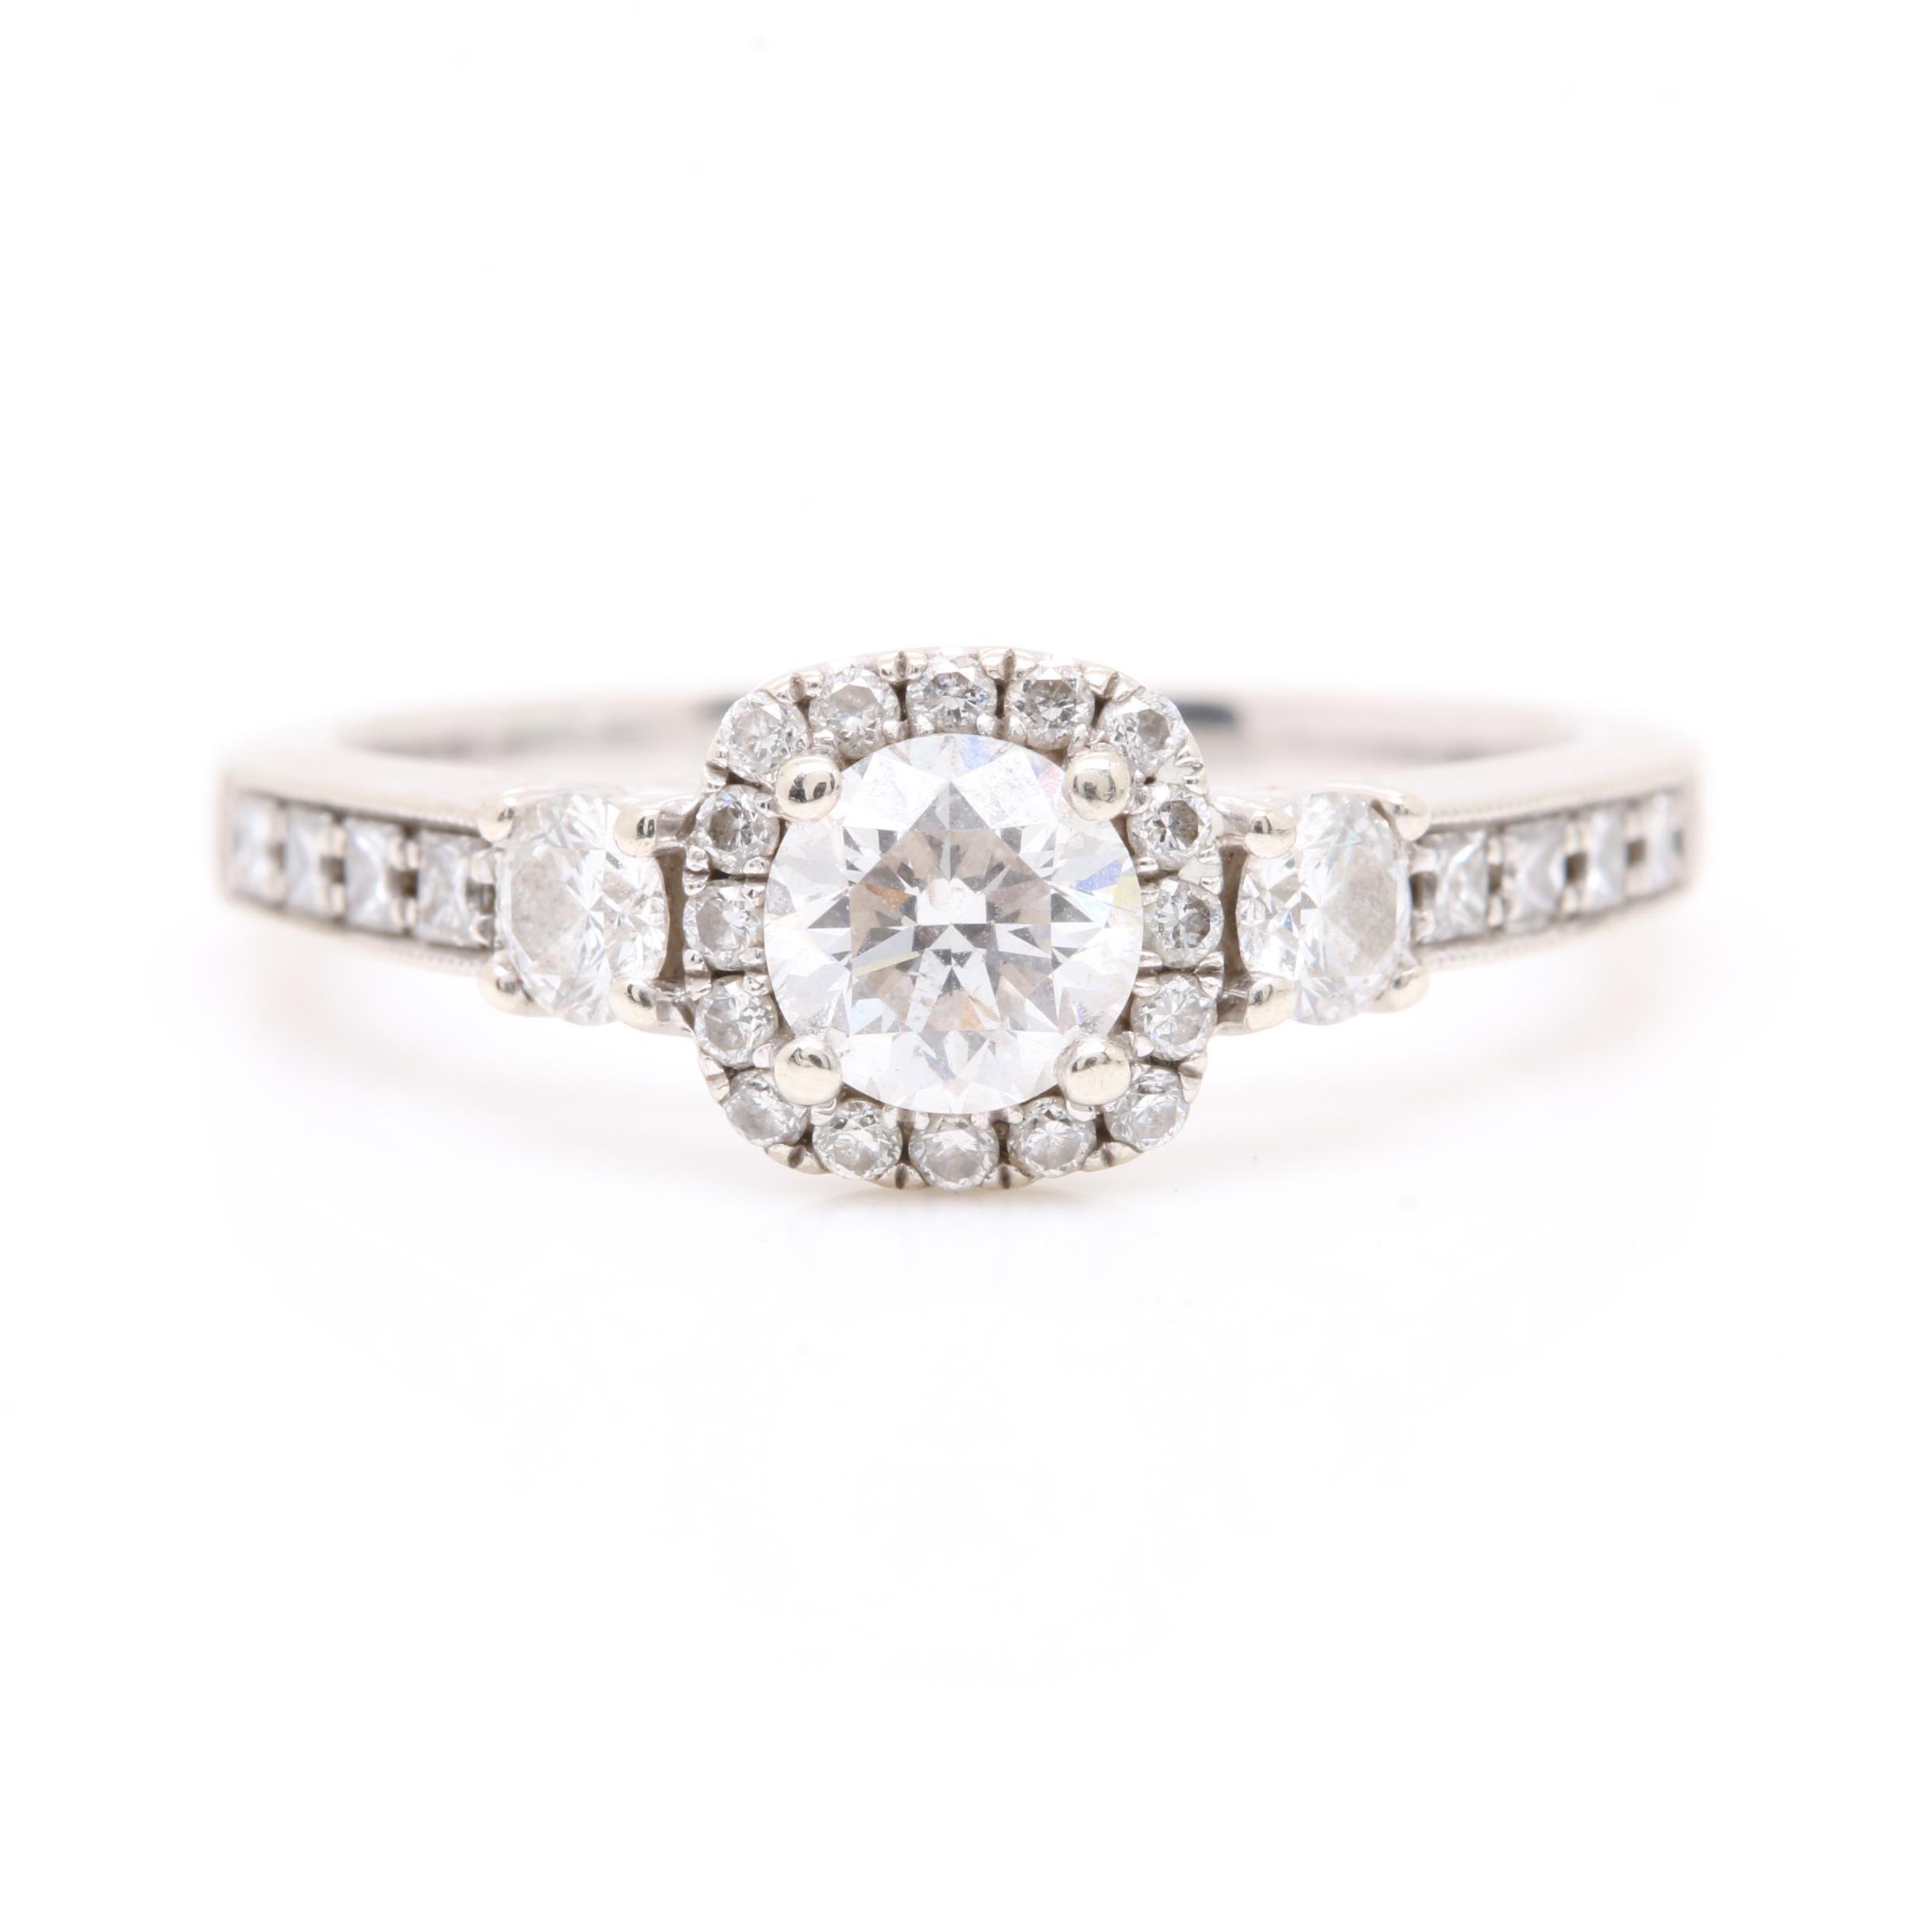 14K White Gold 0.92 CTW Diamond Ring